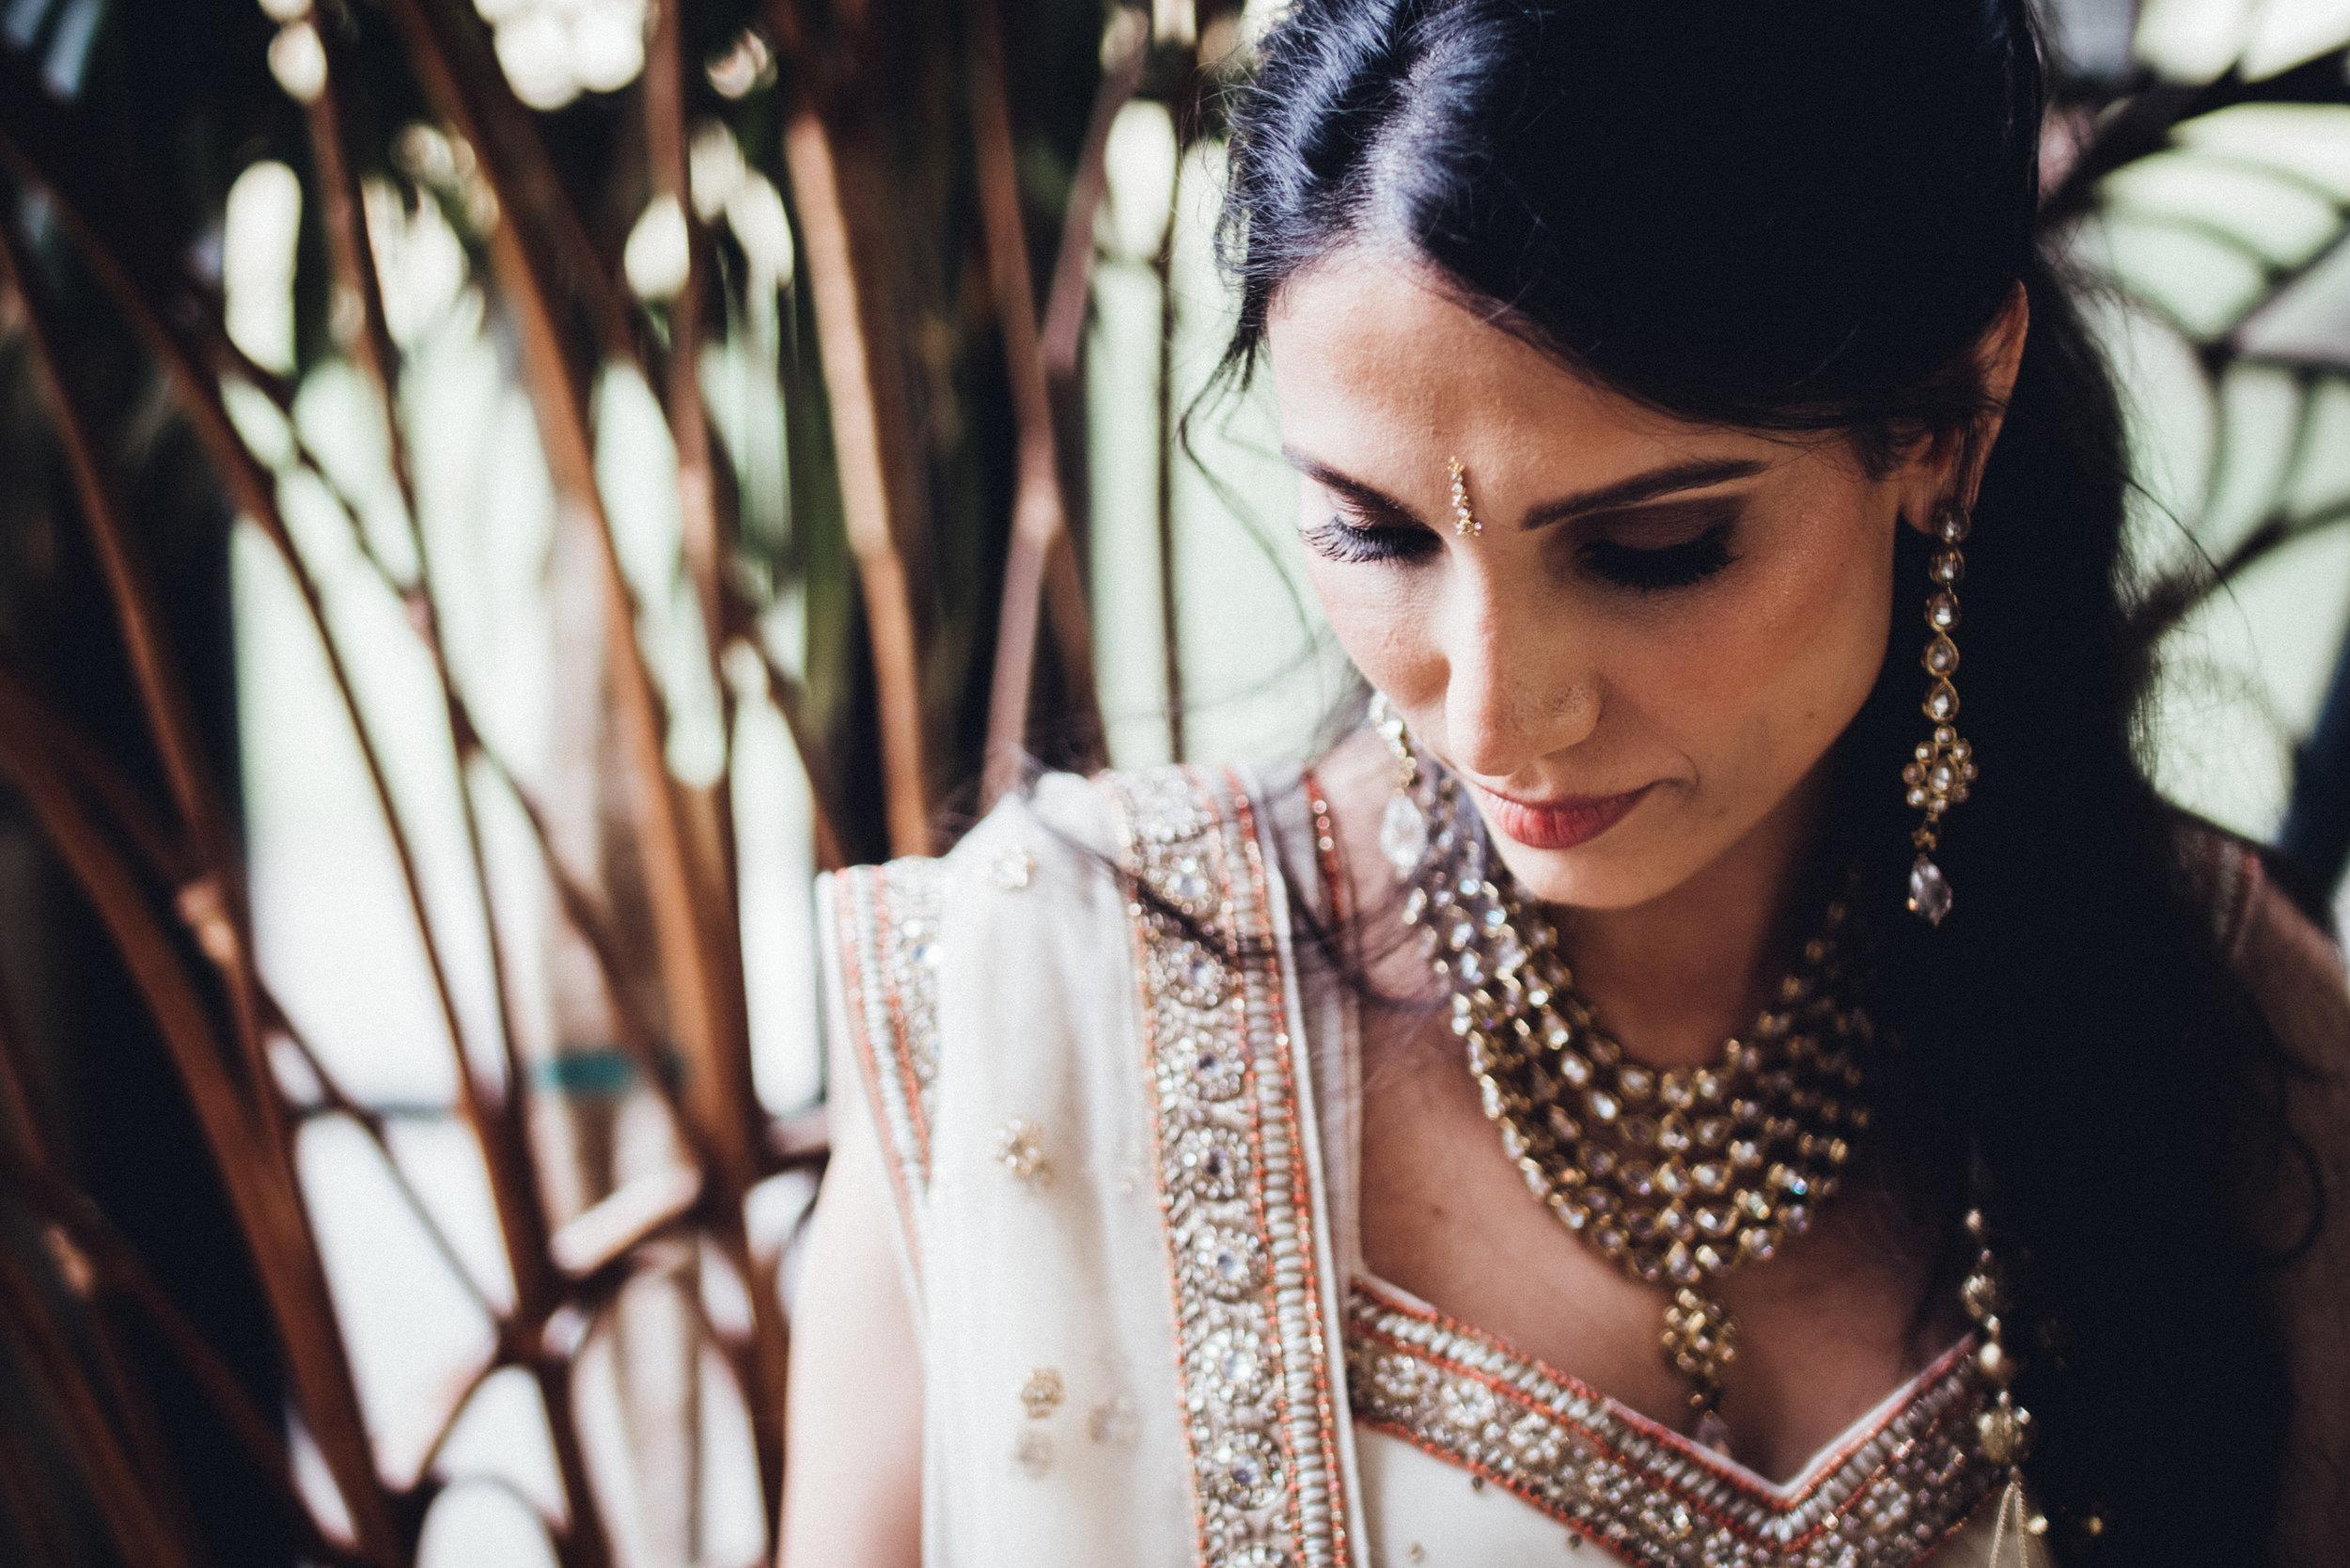 cinematographer-cinematography-cinematographers-photographers-photography-photographer-shadow-shine-pictures-michigan-weddings